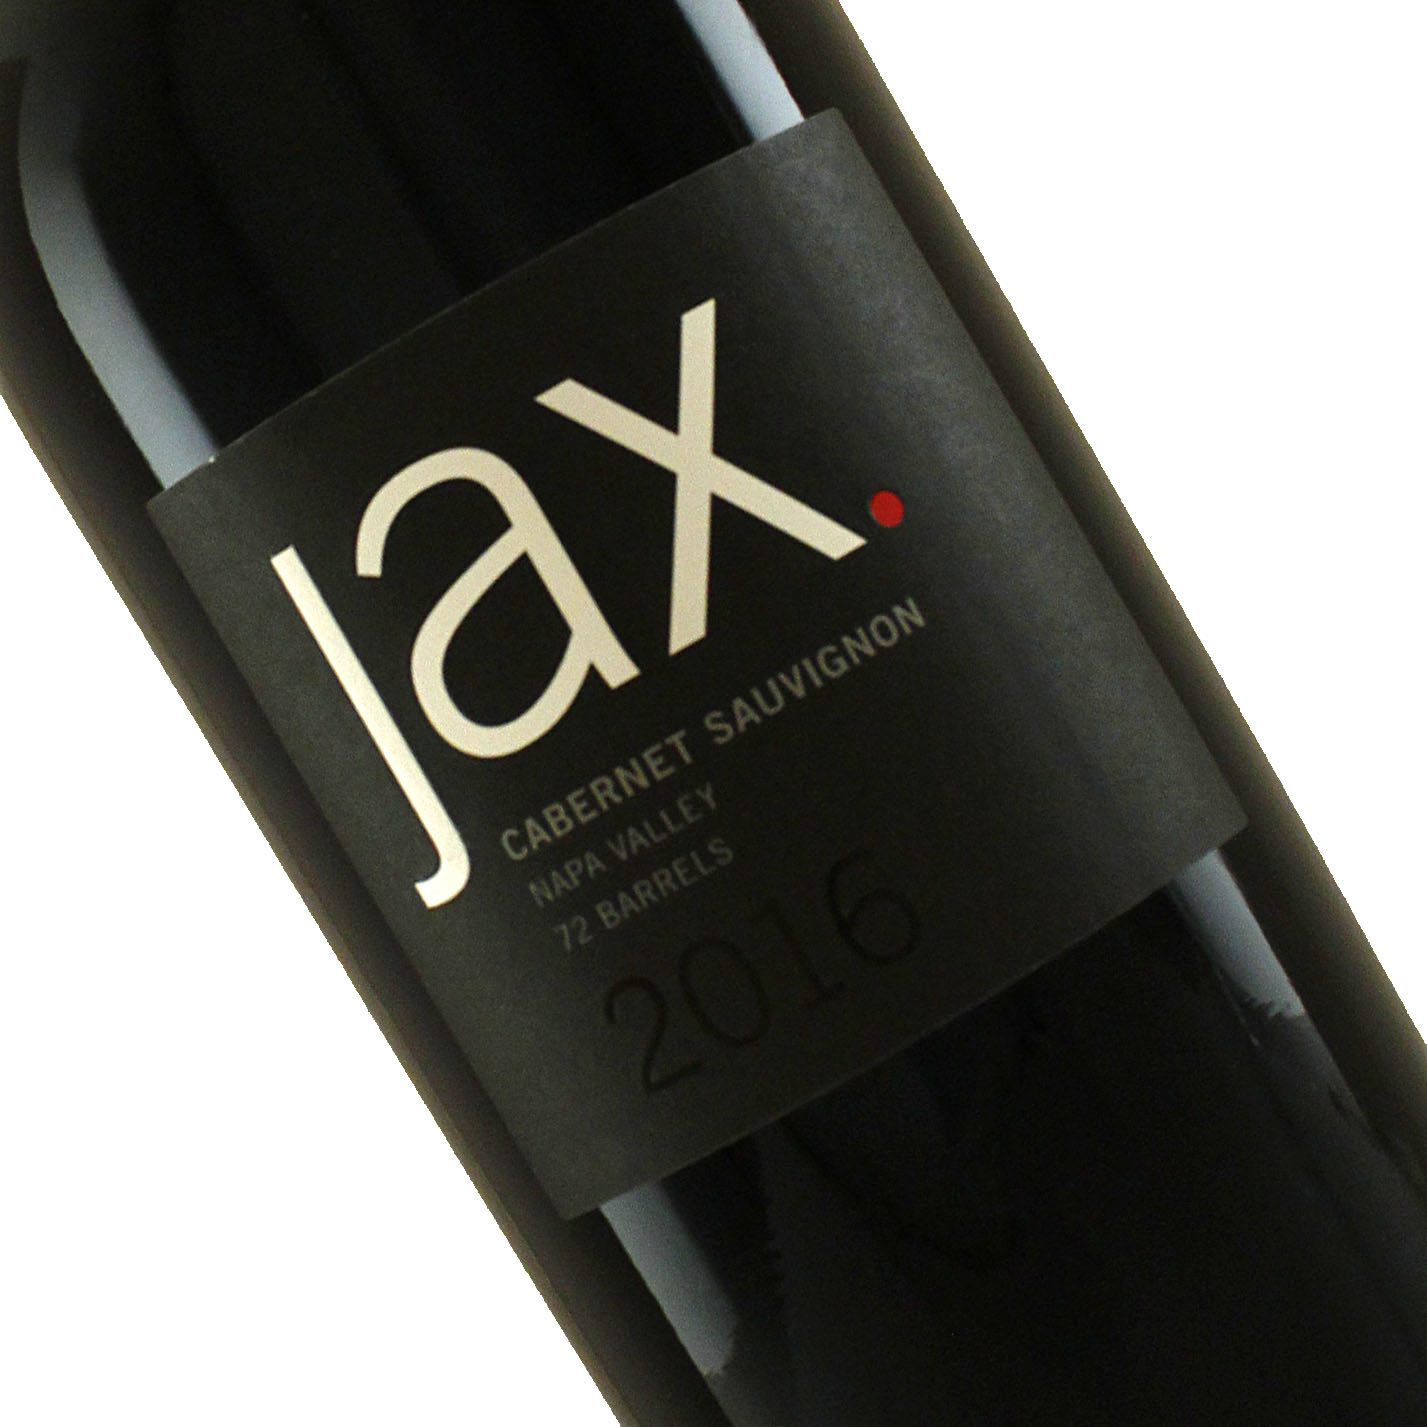 Jax Vineyards 2016 Cabernet Sauvignon, Calistoga Napa Valley